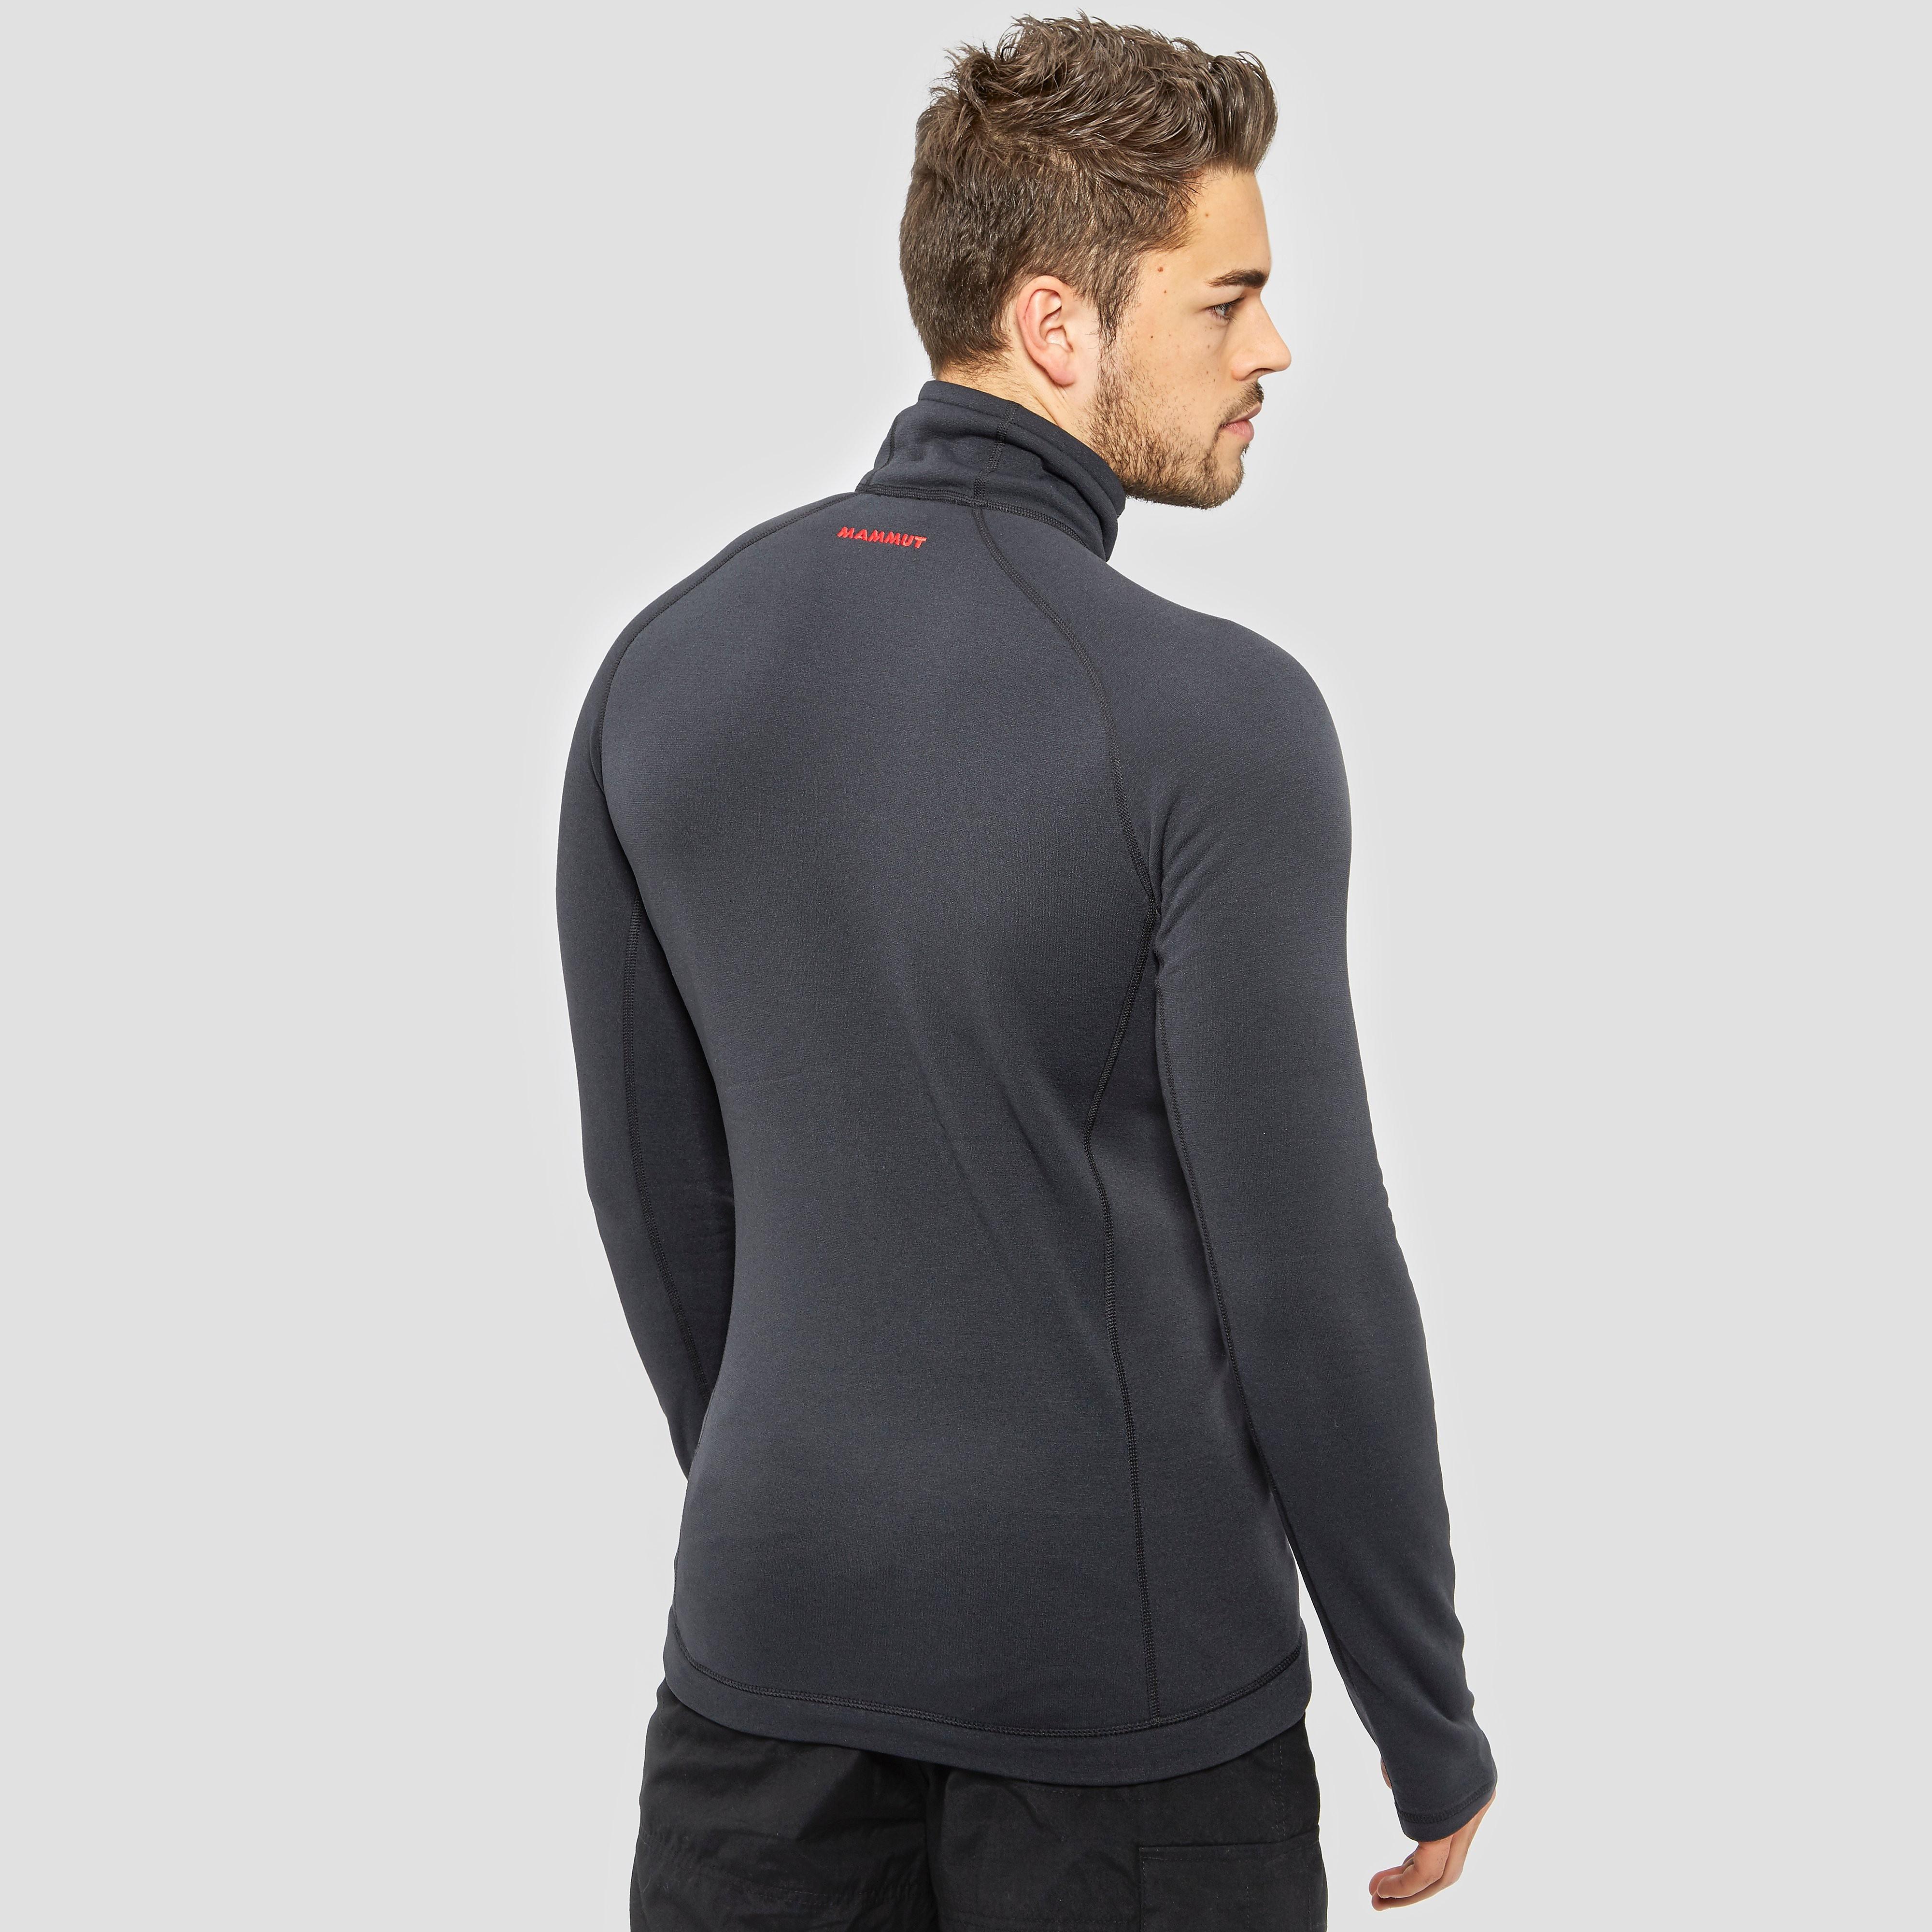 Mammut Trovat Pro Men's Jacket